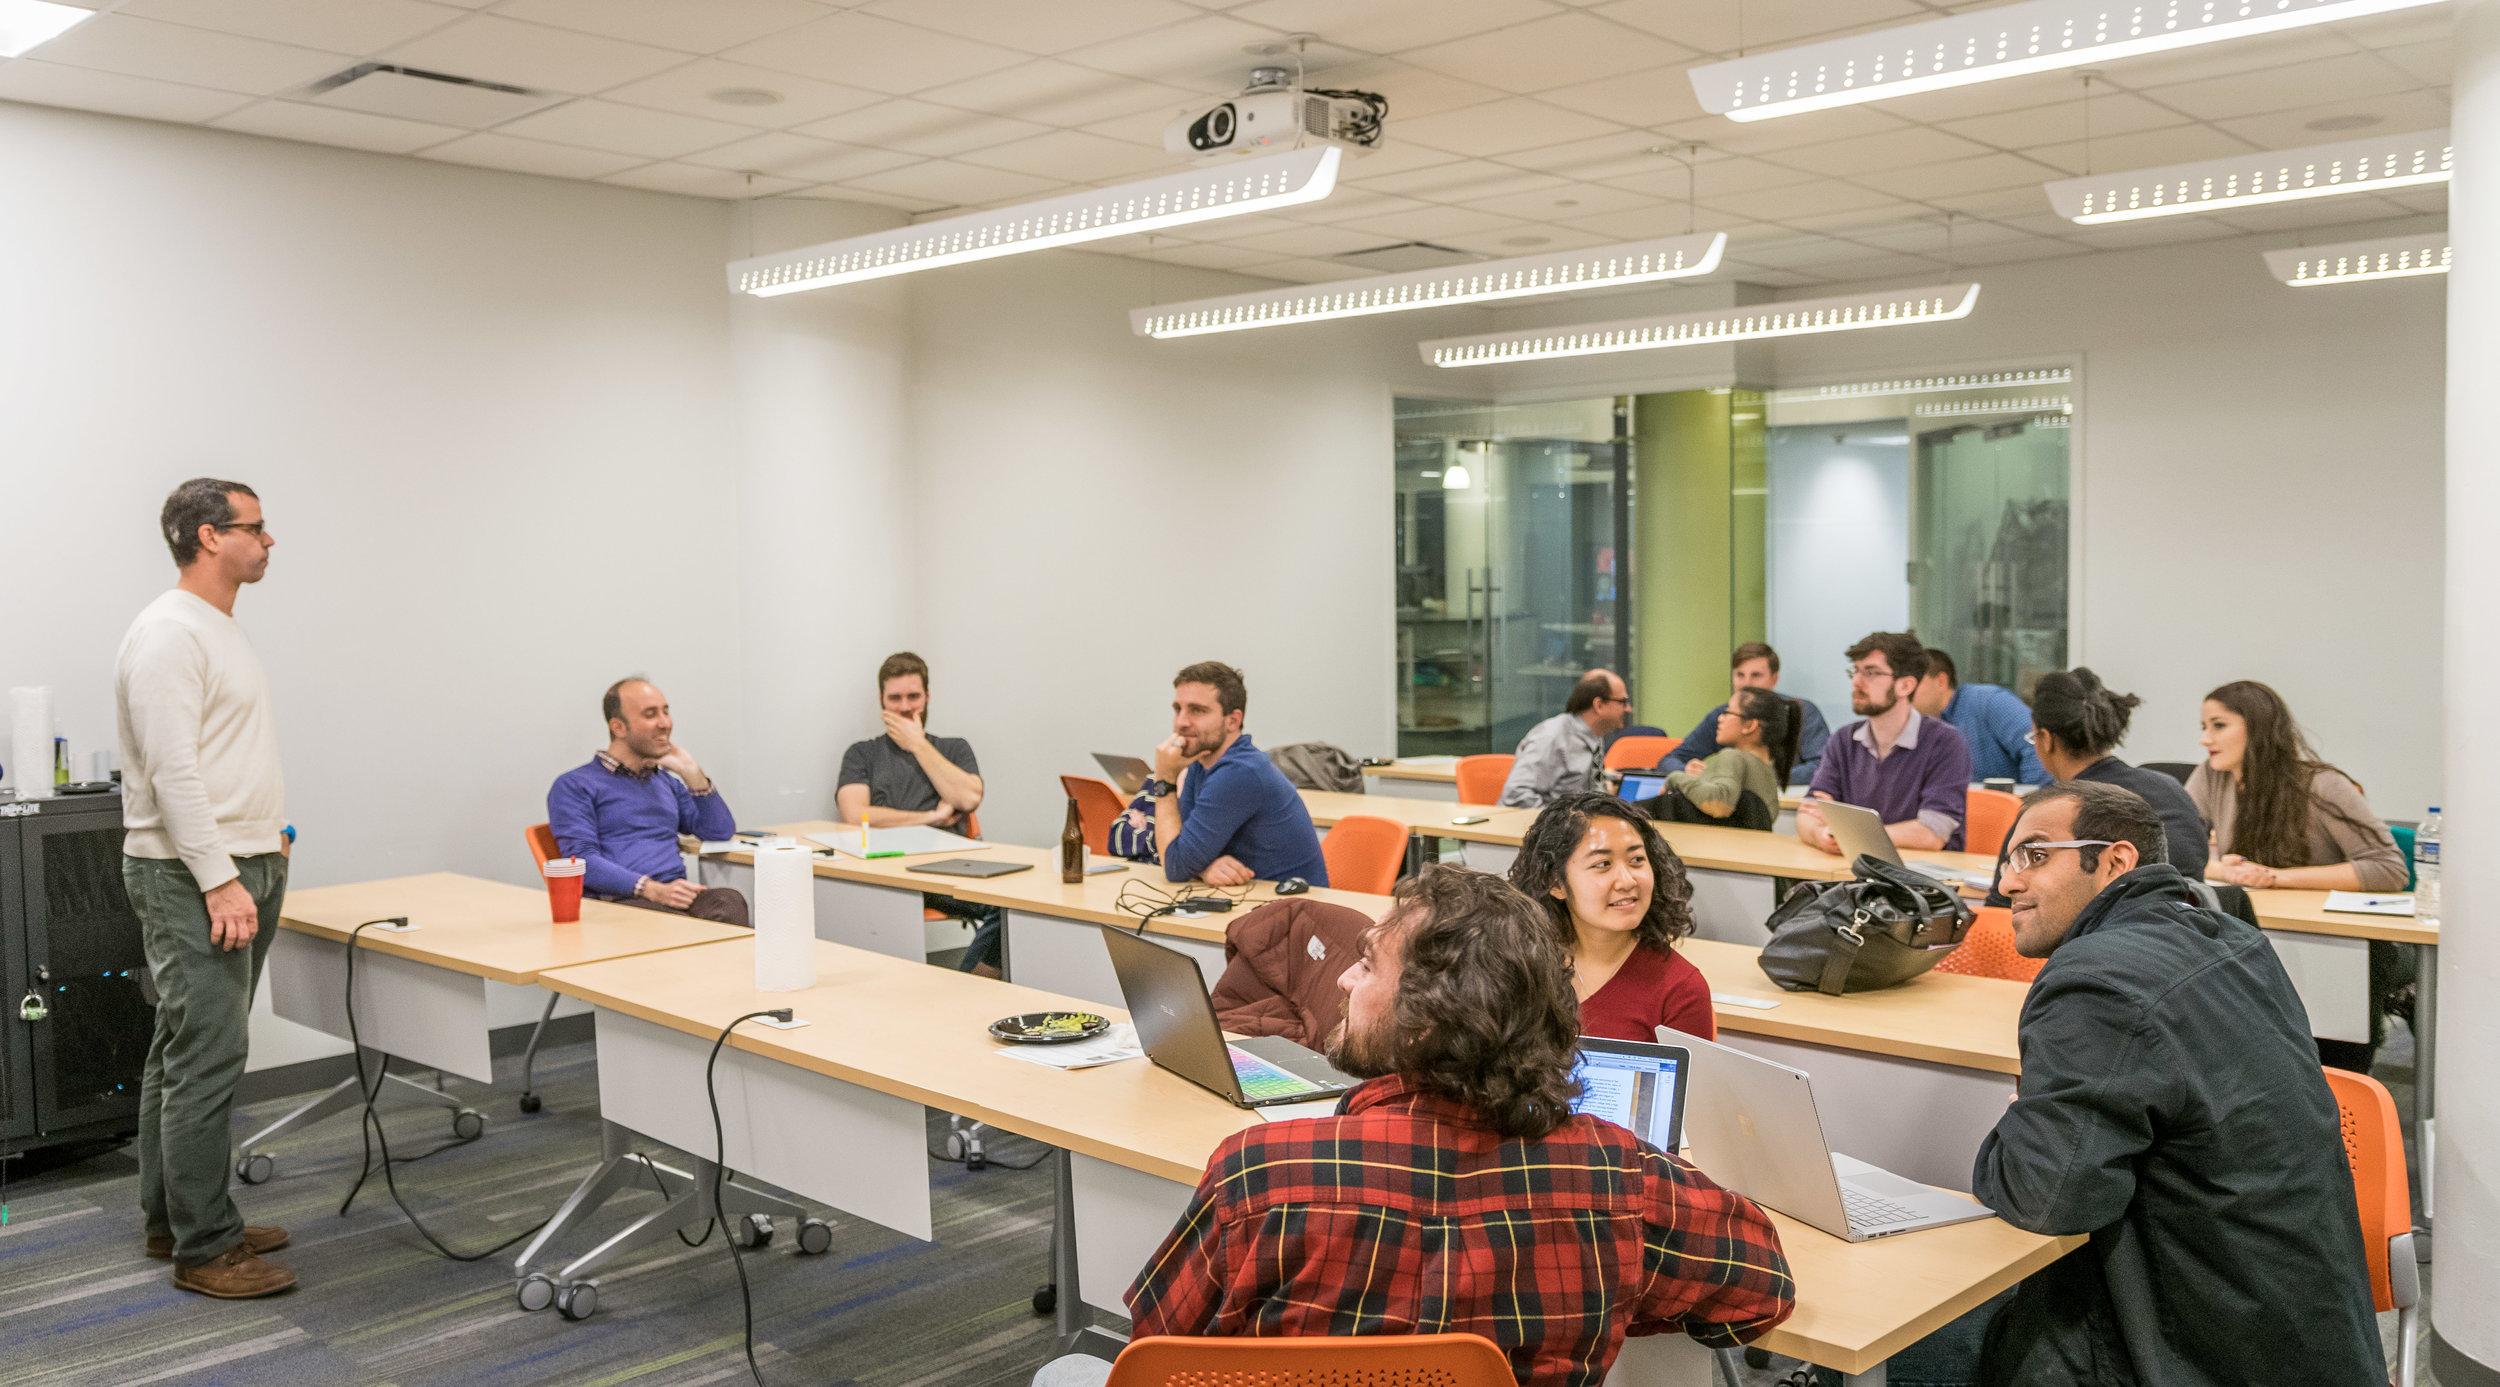 CASTLE PROFESS  Students enrolled in course GRAD 511: Foundations of Evidence-Based STEM Pedagogy